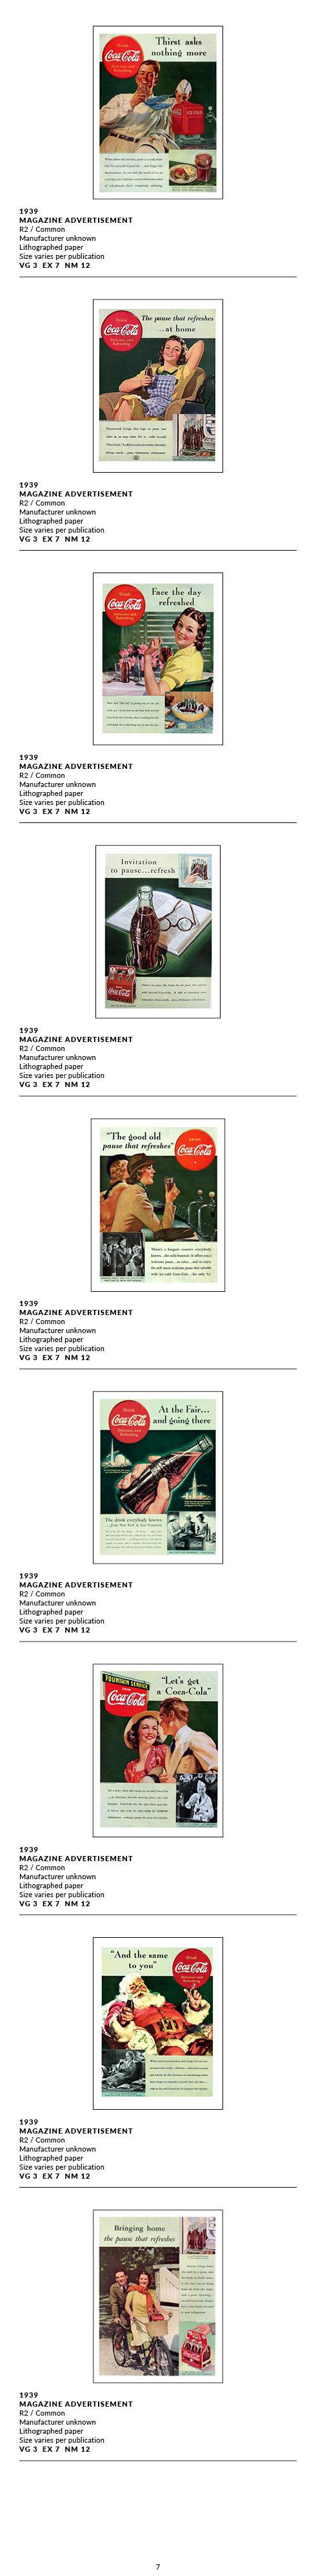 1935-39 Ads7.jpg